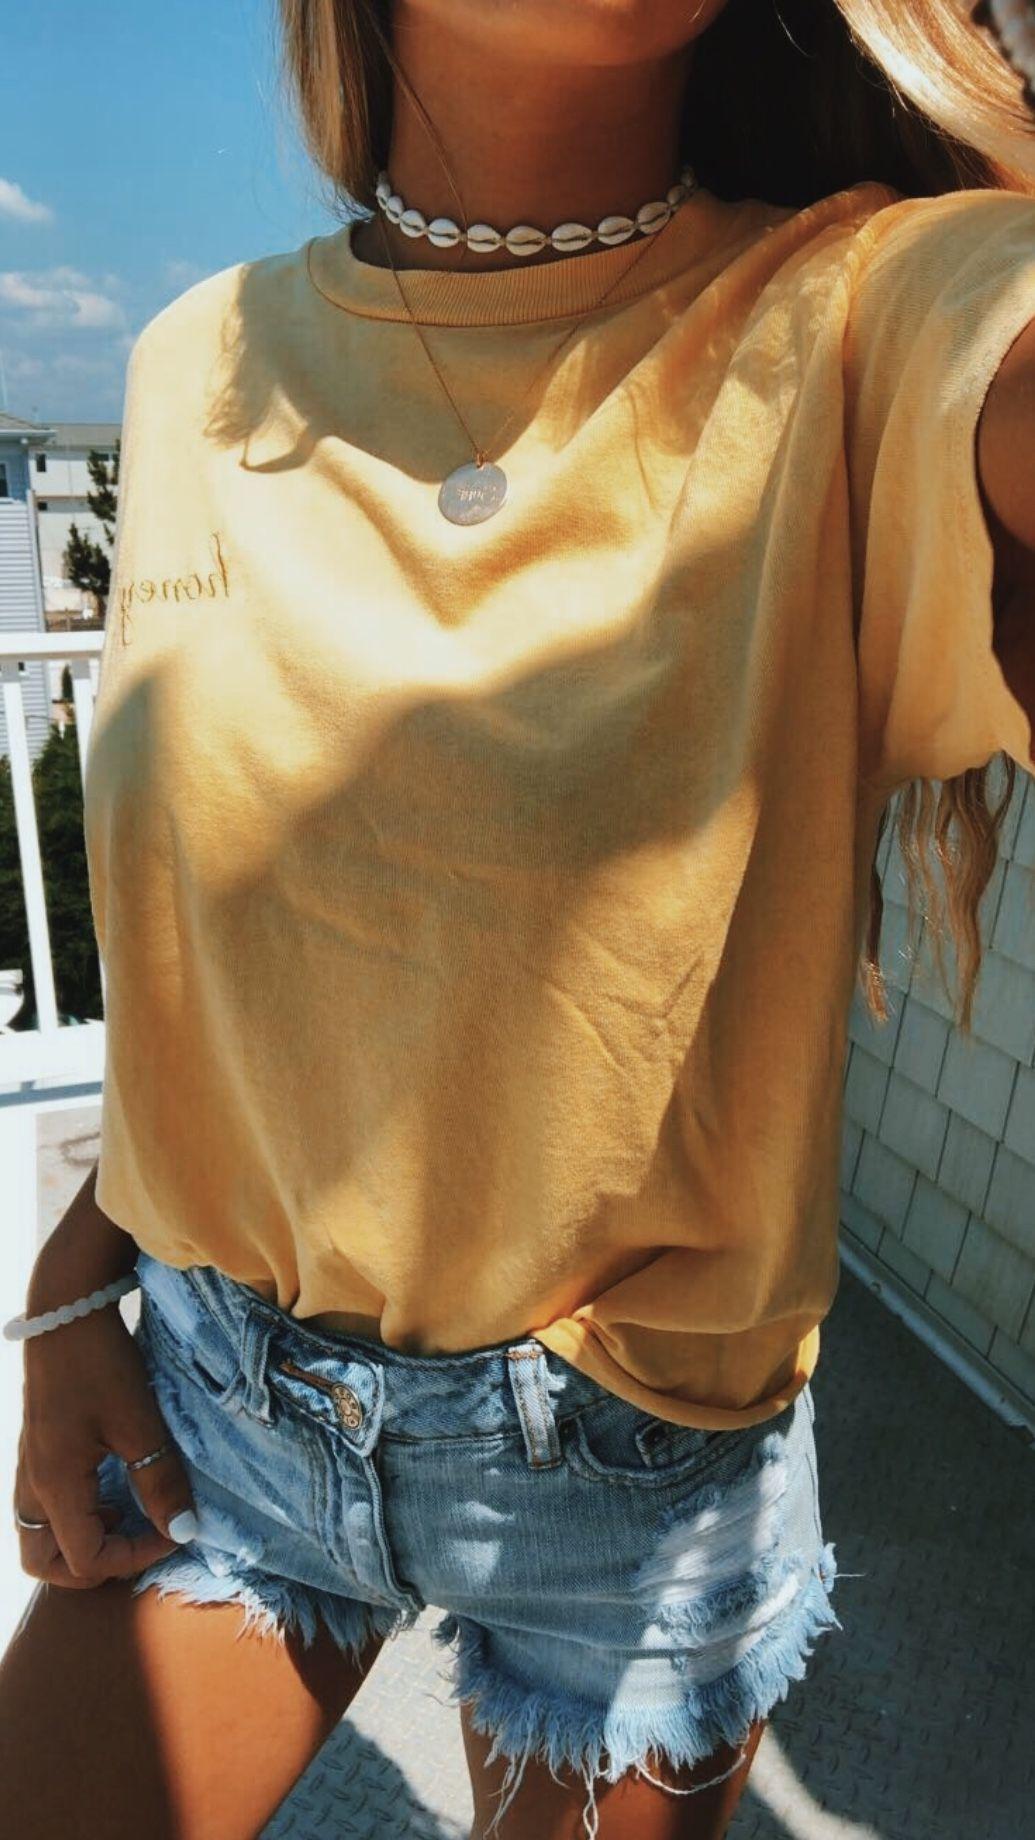 Жёлтая футболка фото 15